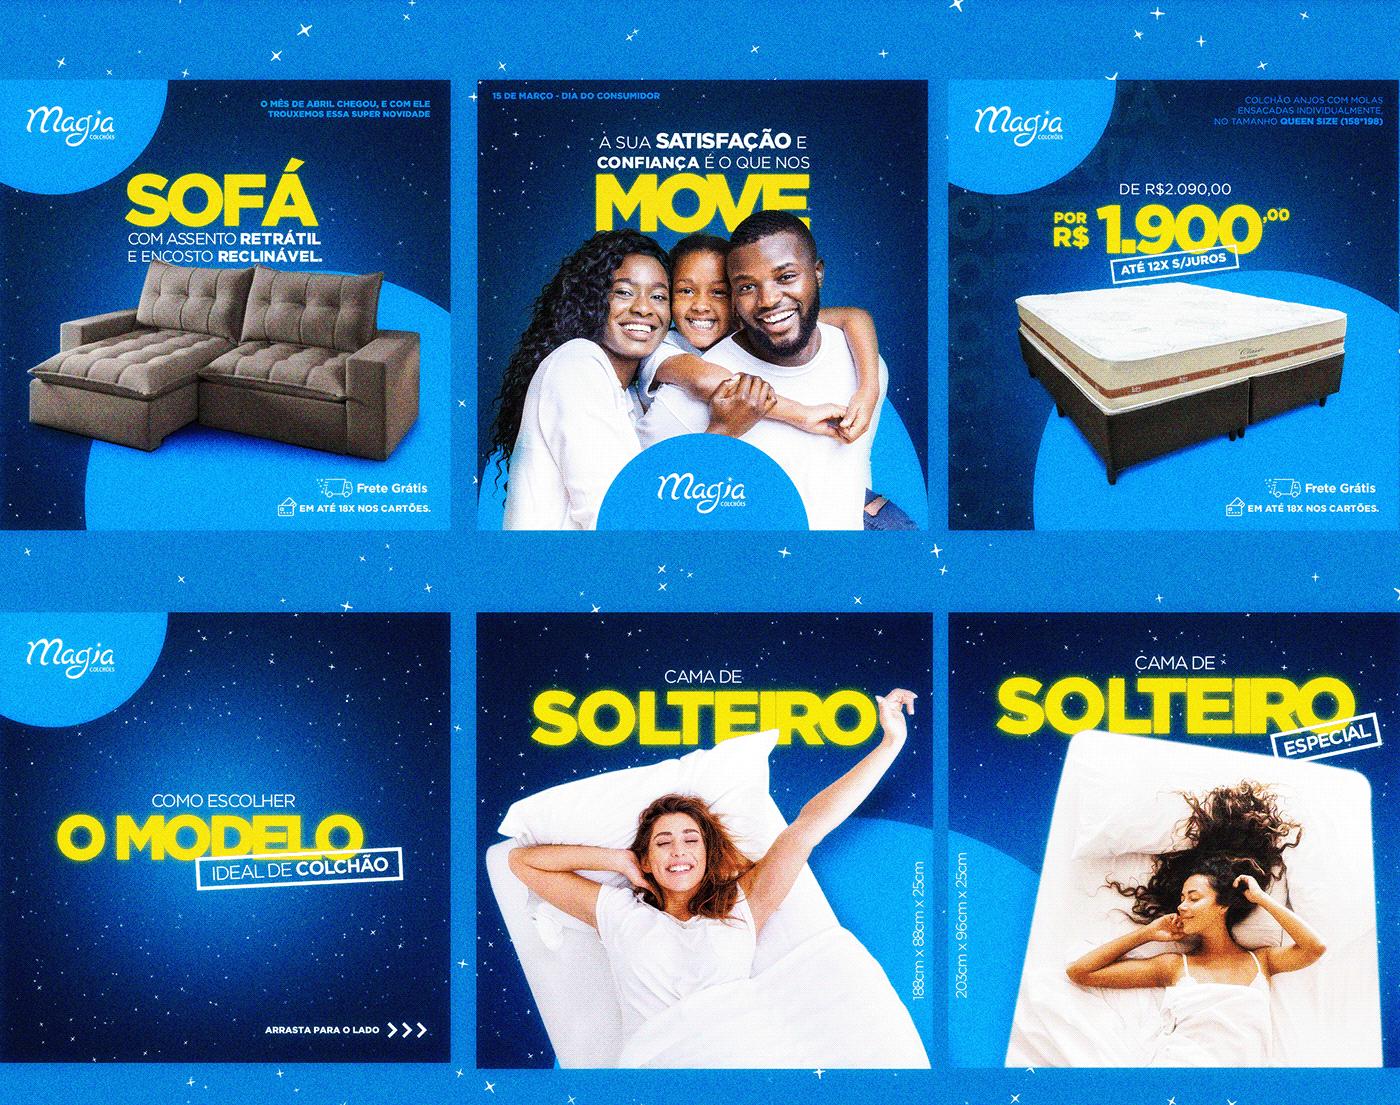 Behance clean design furniture magia colchões Magic   mattresses Sofisticado universe visual concept